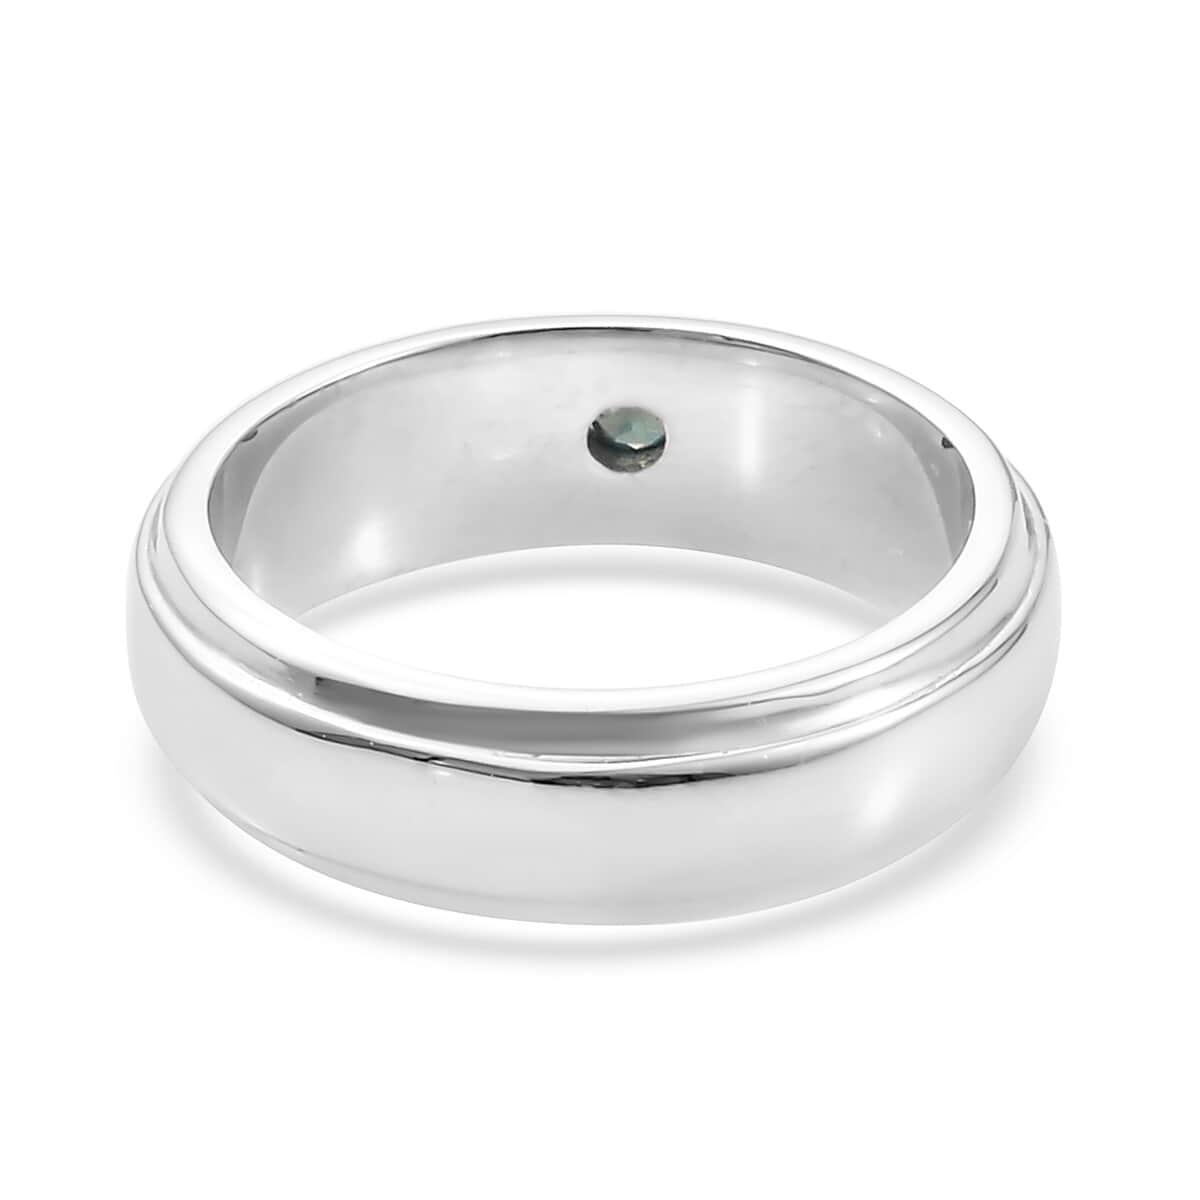 Narsipatnam Alexandrite Men's Band Ring in Platinum Over Sterling Silver (Size 12.0) (9.10 g) 0.05 ctw